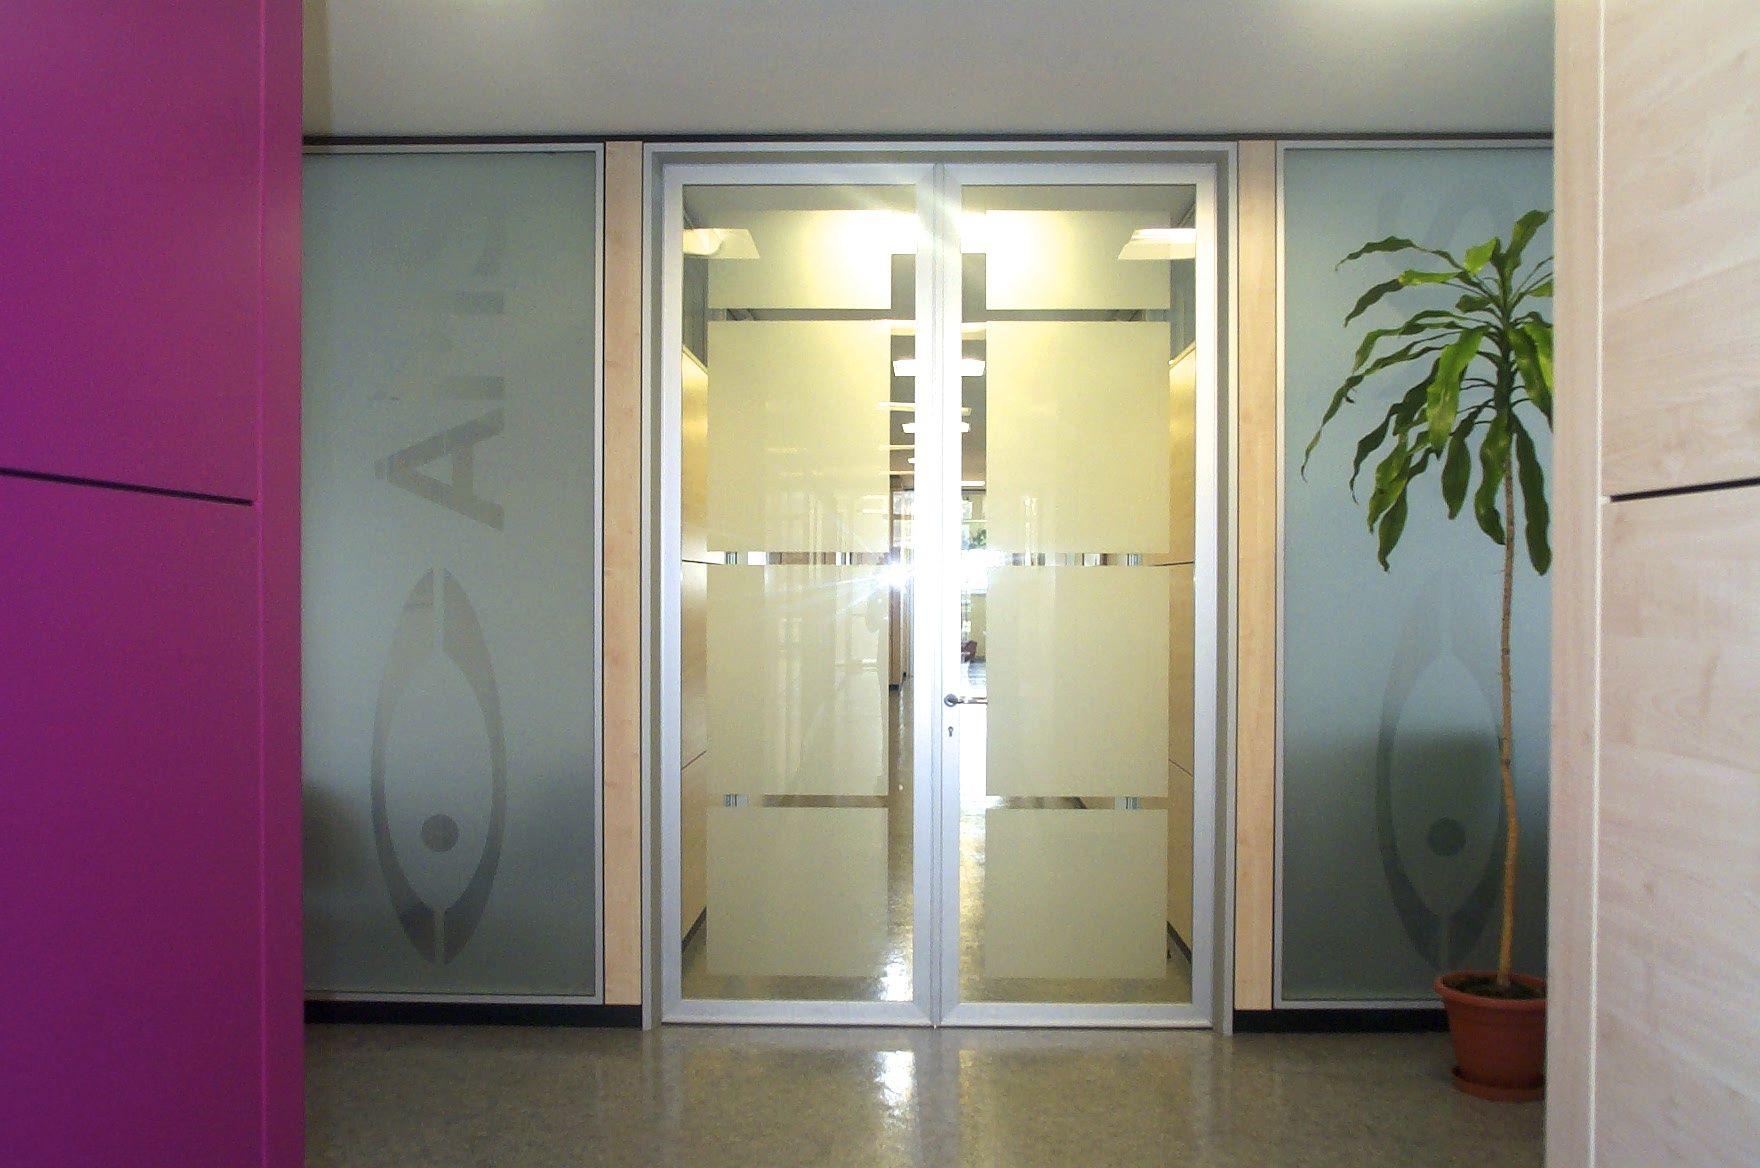 Uffici direzionali _ Napoli